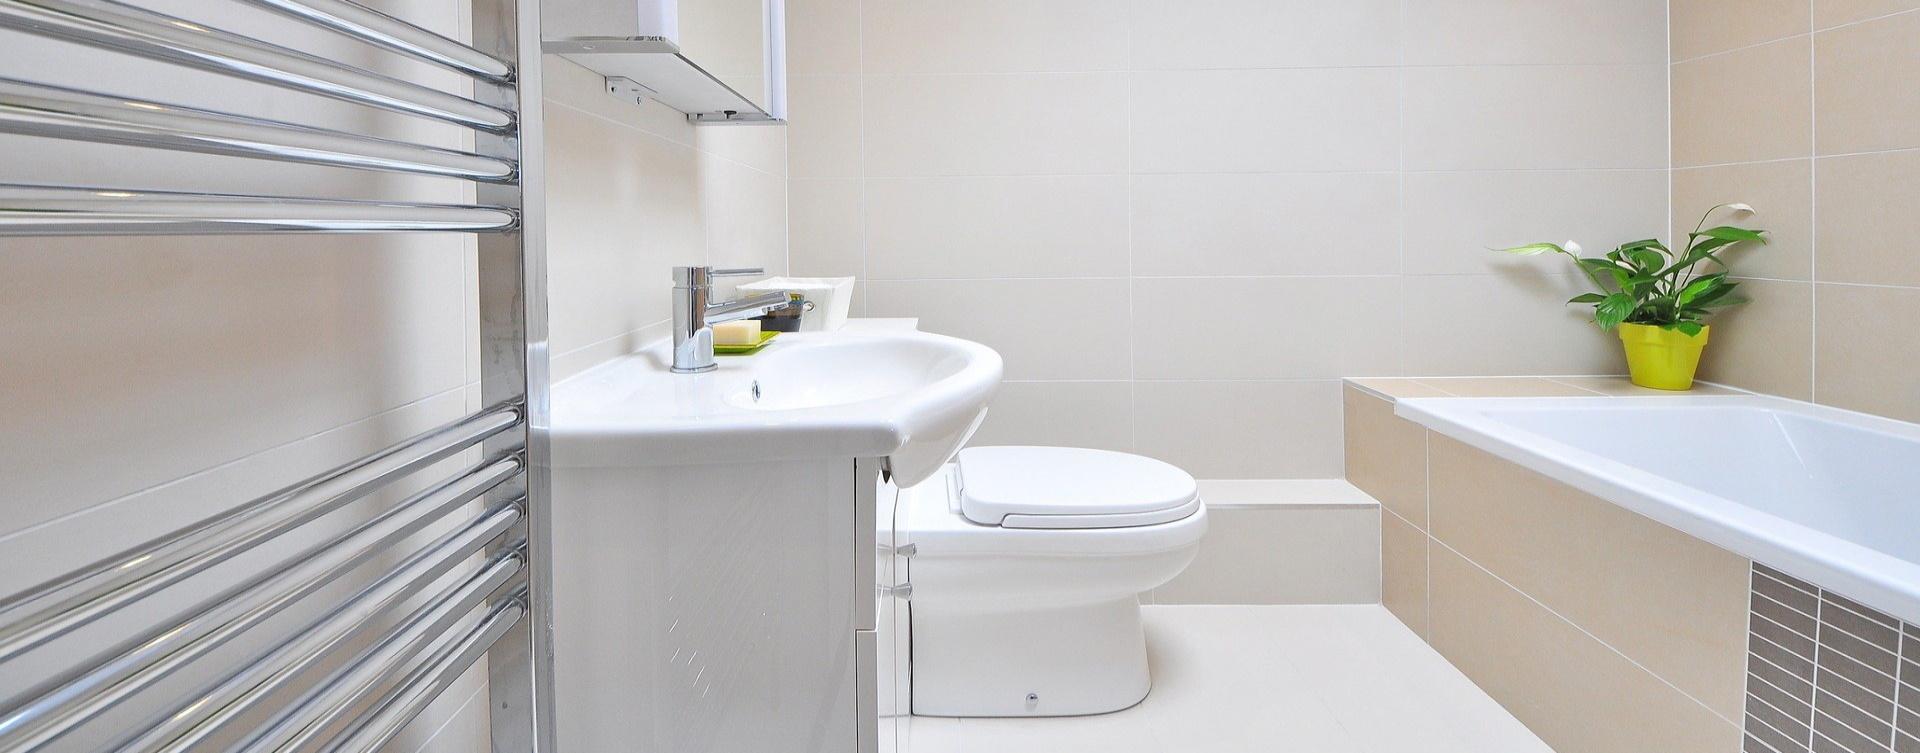 Bathroom Installation South East London